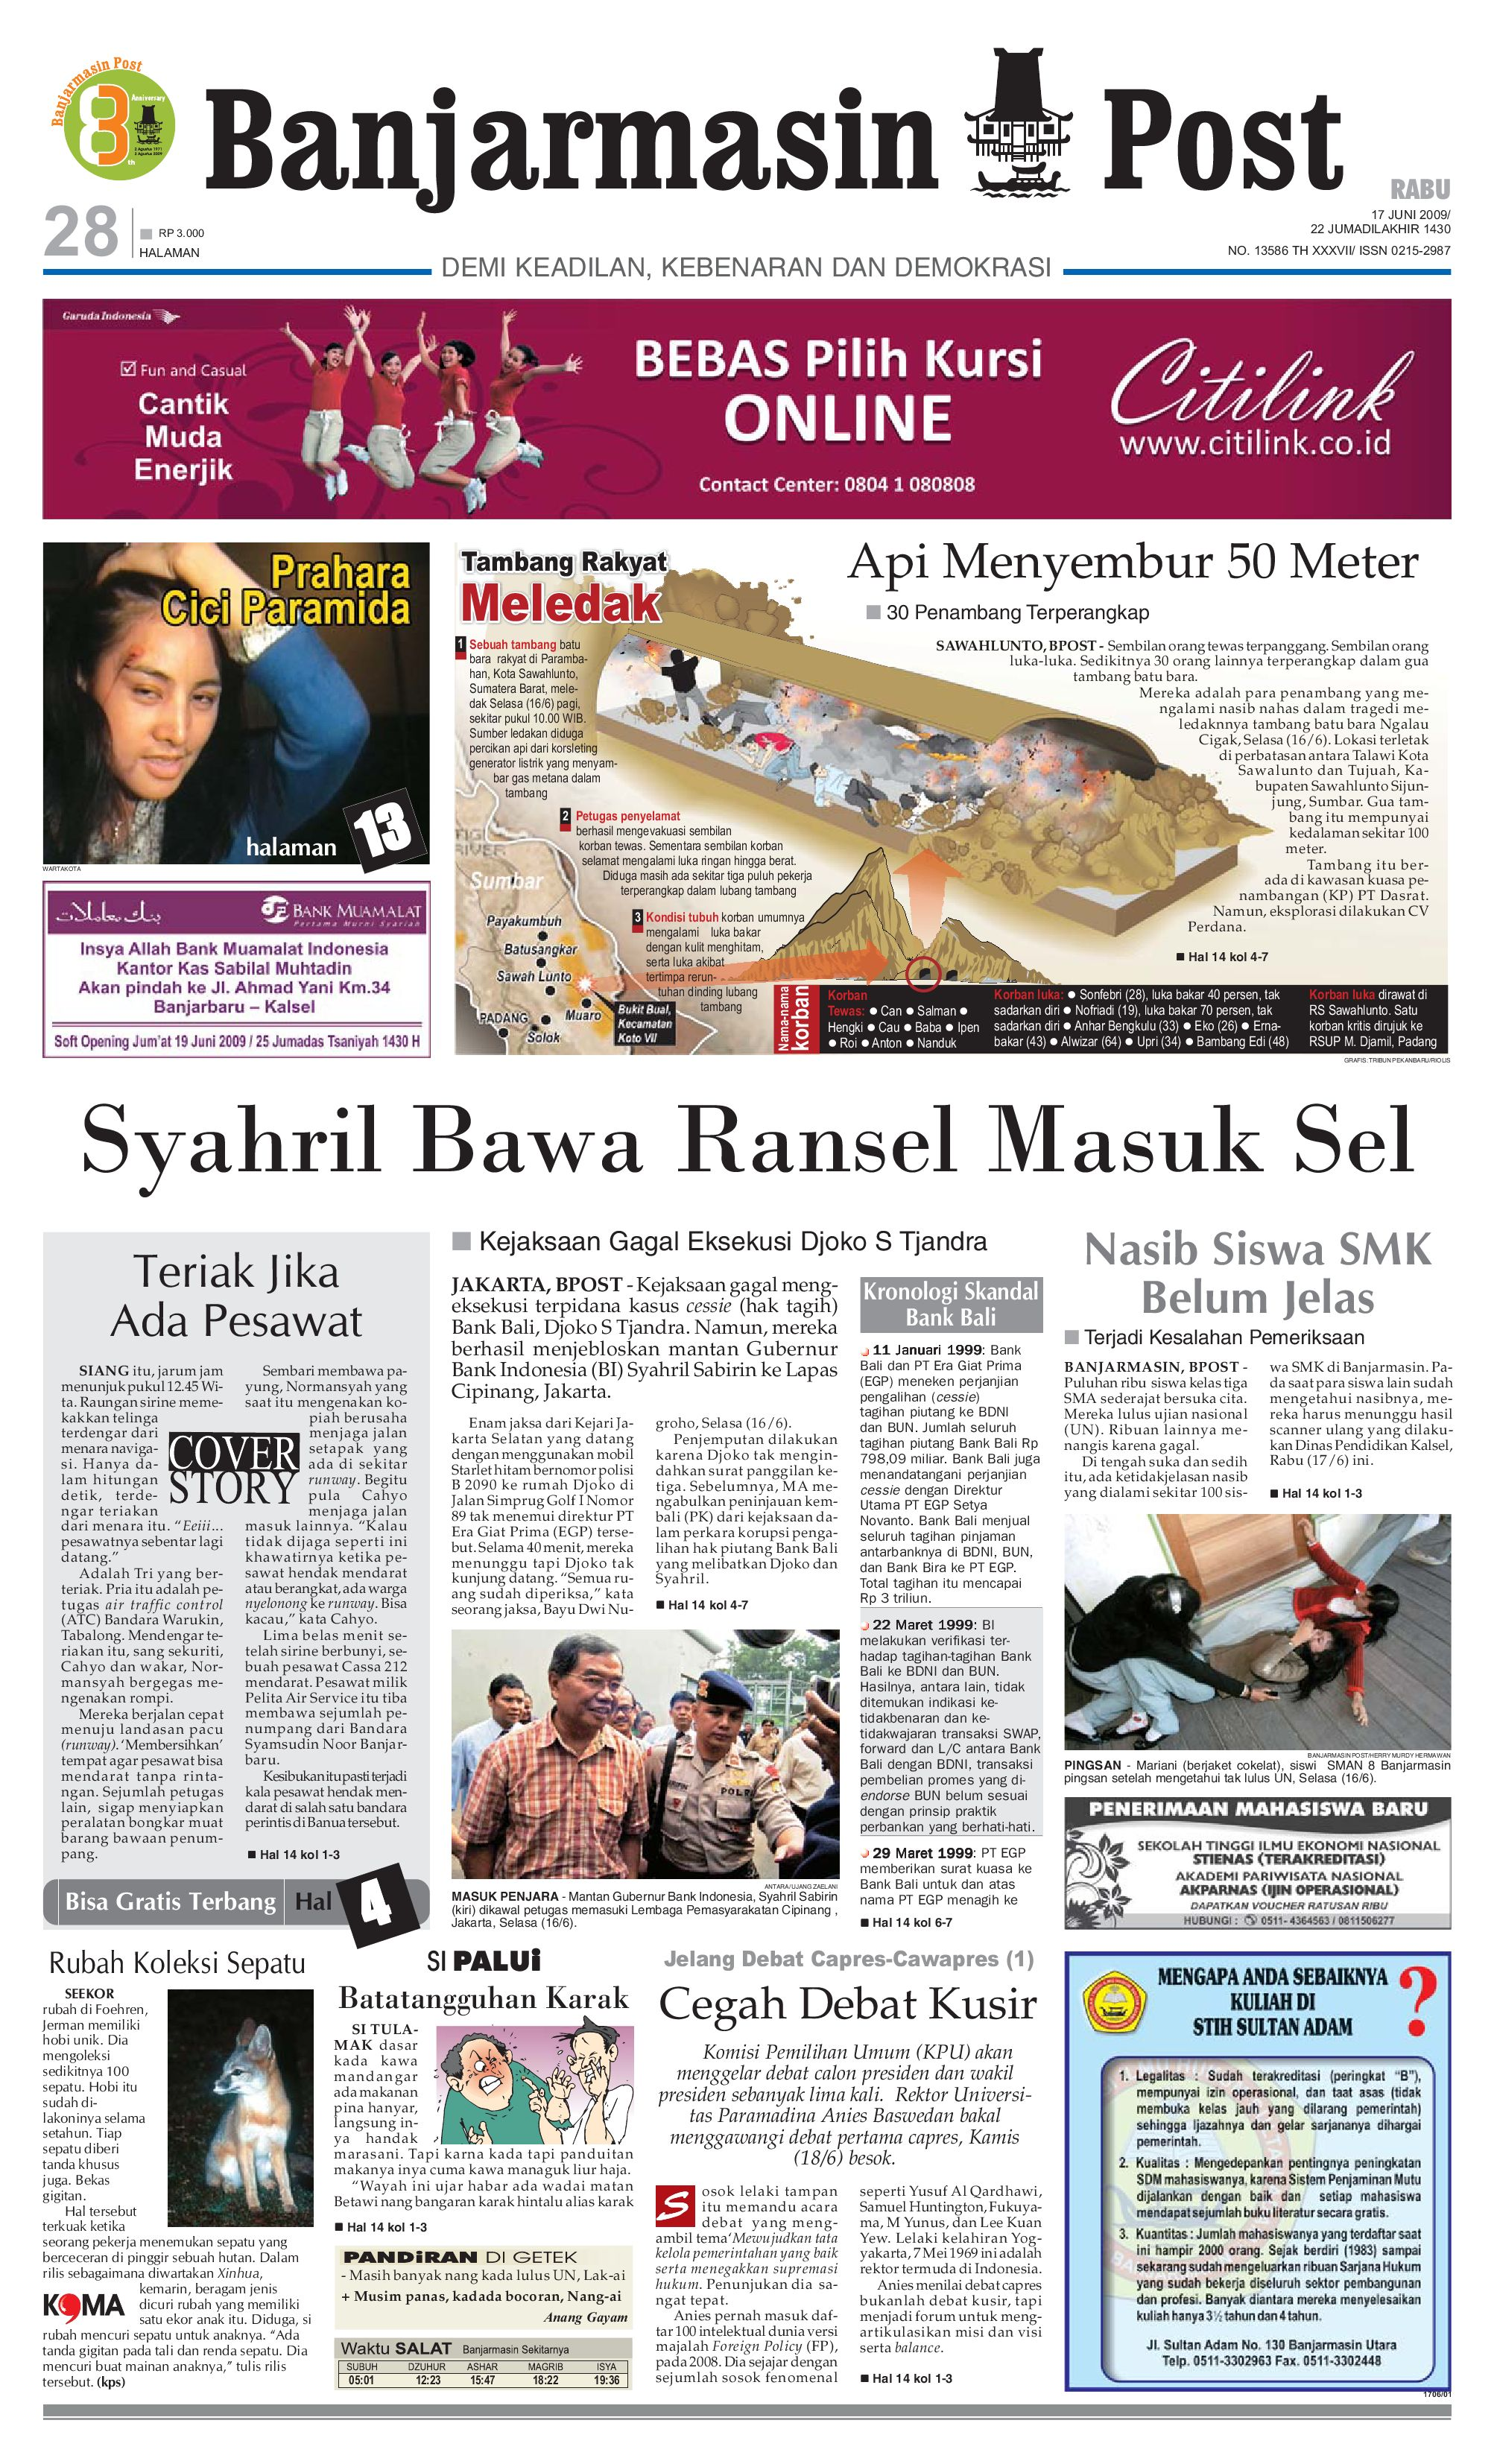 Banjarmasin Post Edisi Rabu 17 Juni 2009 By Issuu Tcash Vaganza 39 Bantal Mobil 3 In 1 Juventus Aksesoris